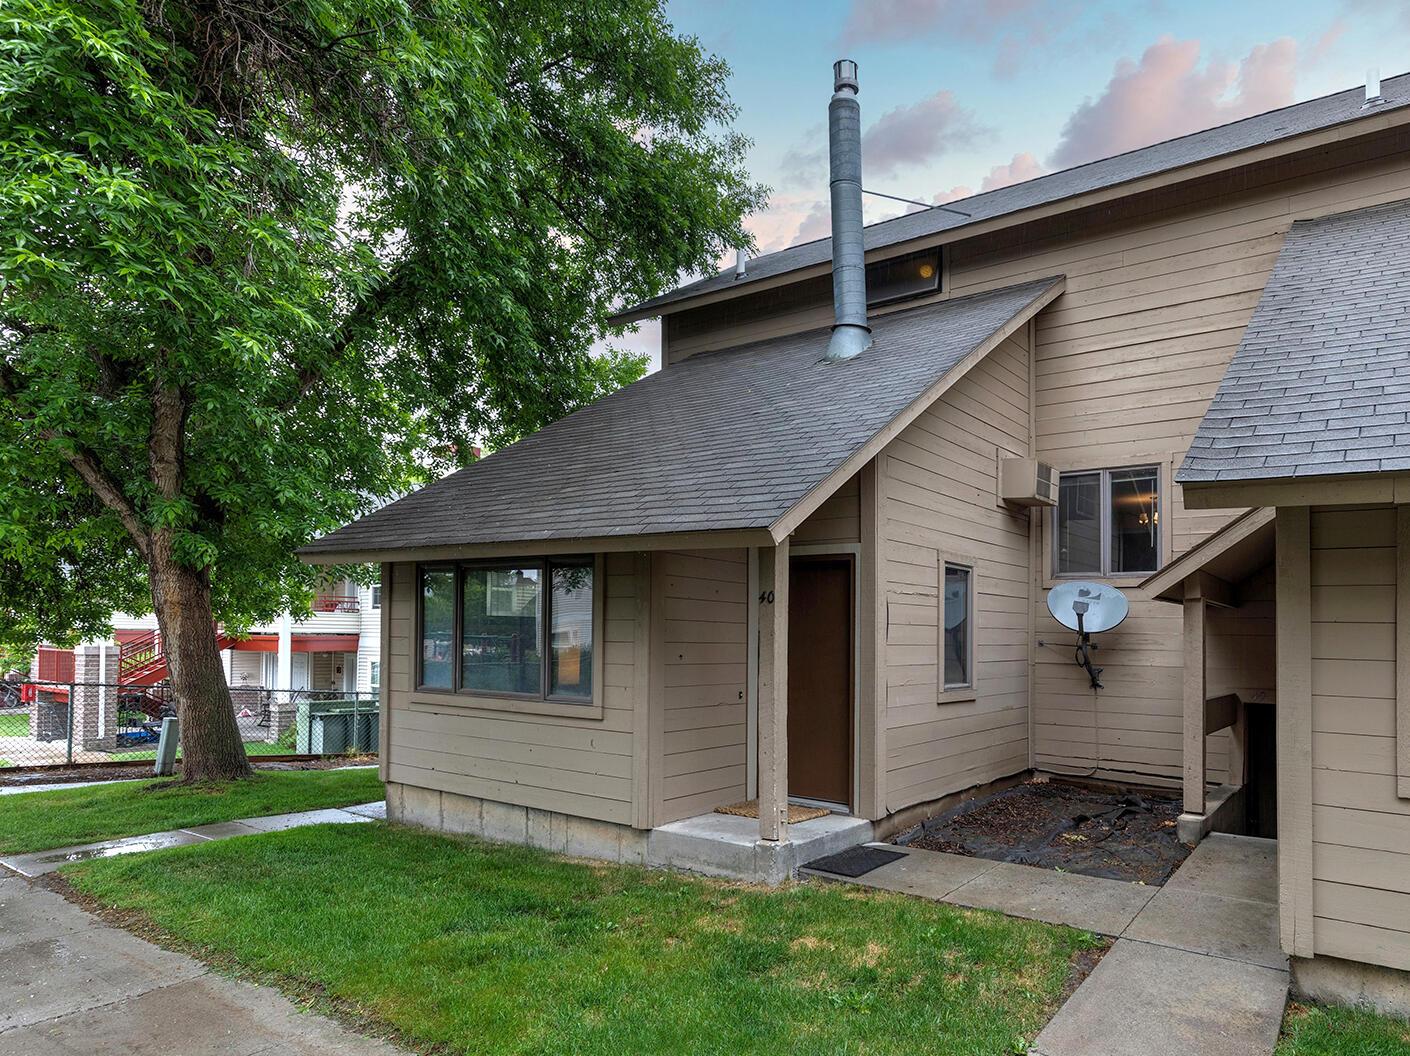 3811 Stephens Avenue Unit # 40, Missoula, MT 59801